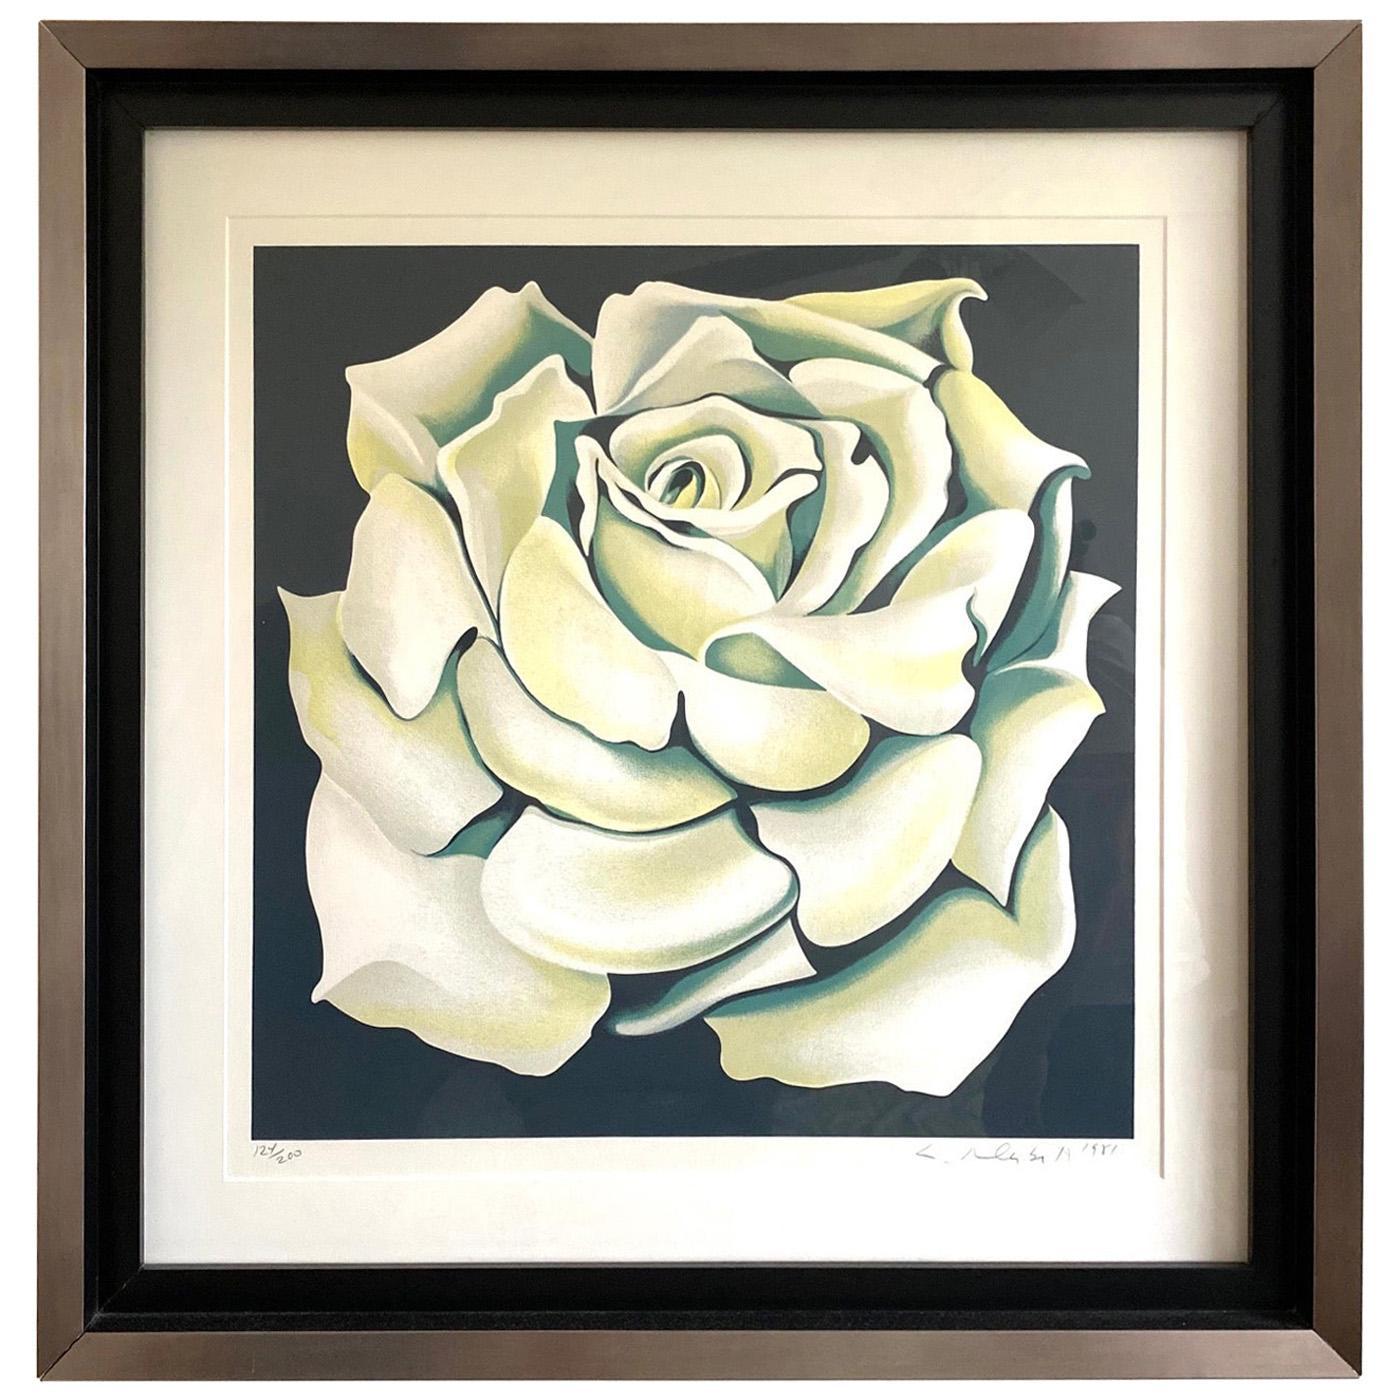 Lowell Nesbitt White Rose Limited Edition Lithograph in Custom Frame, circa 1981